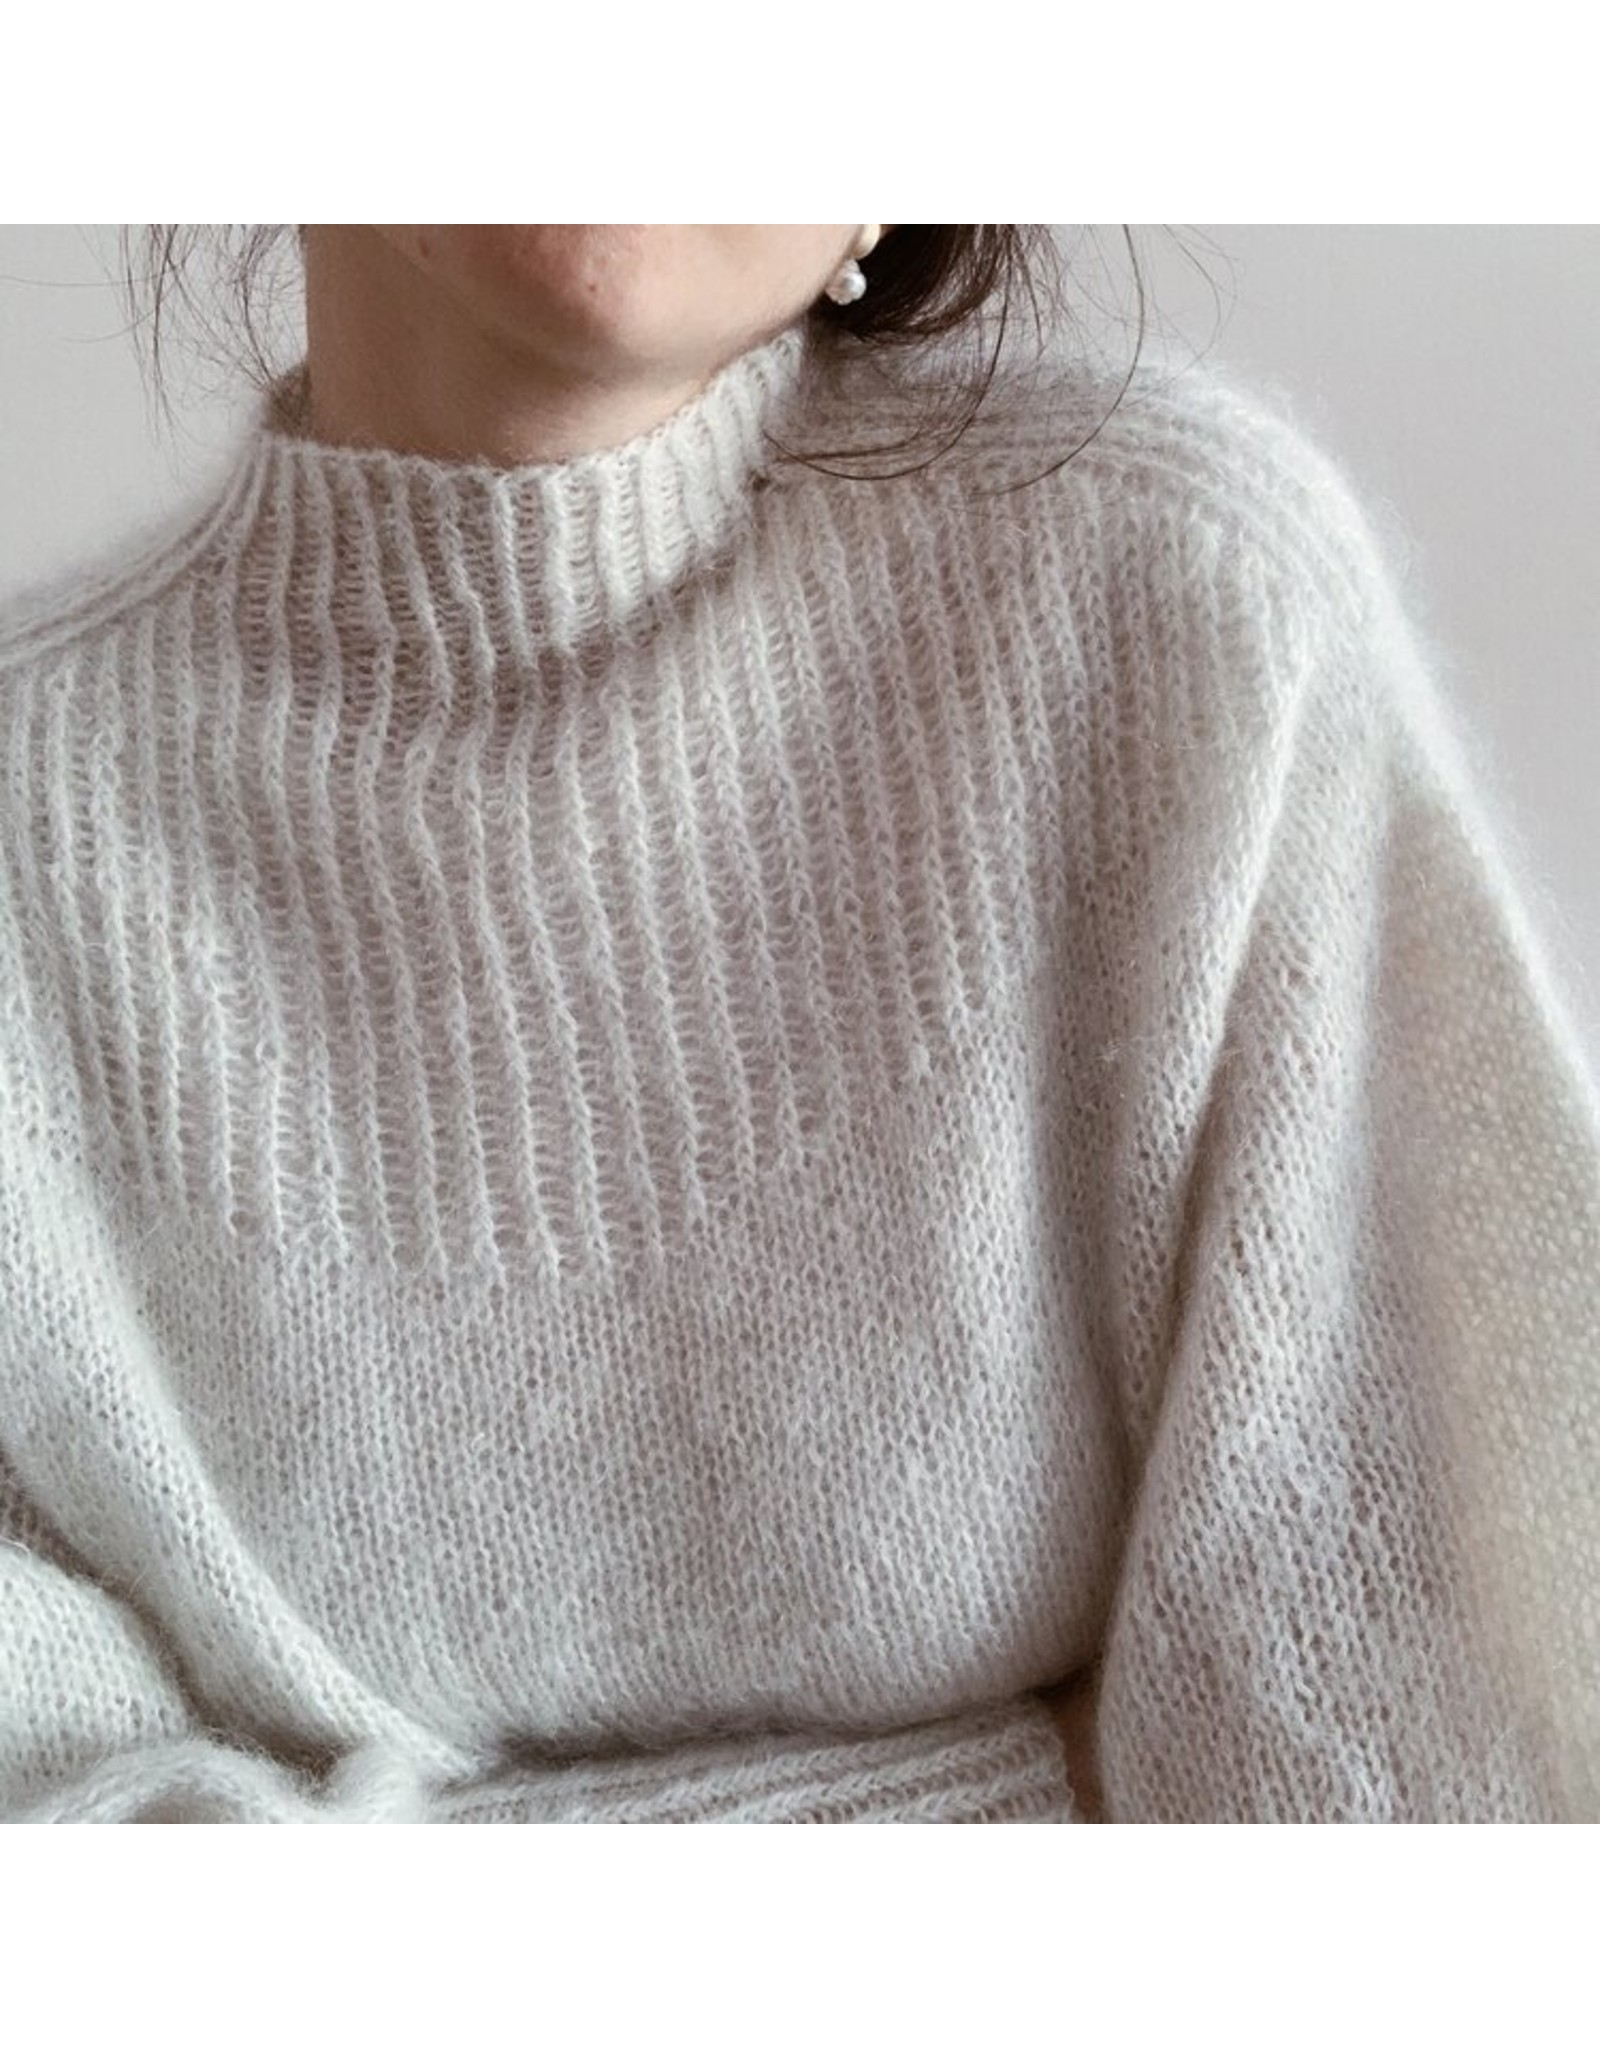 Patroon GF Ulla sweater